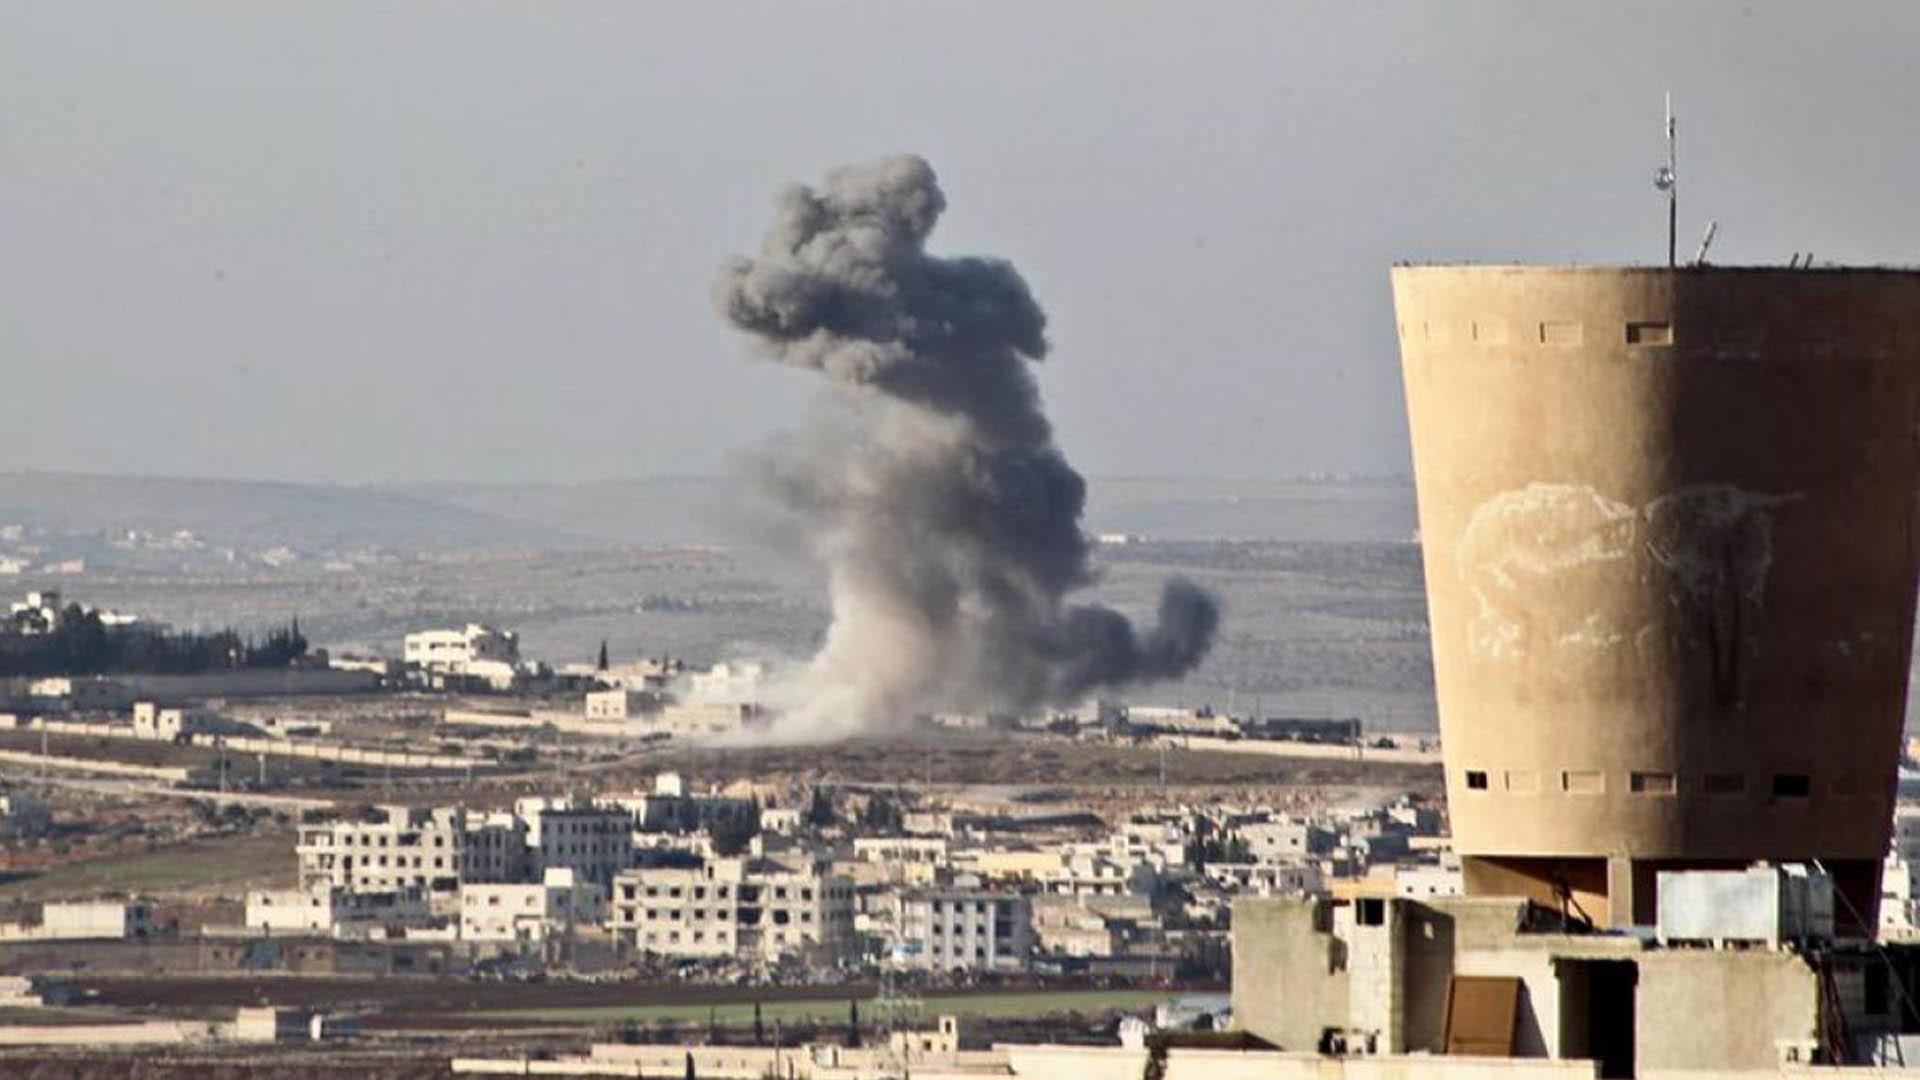 Otan pide cese de hostilidades en Siria